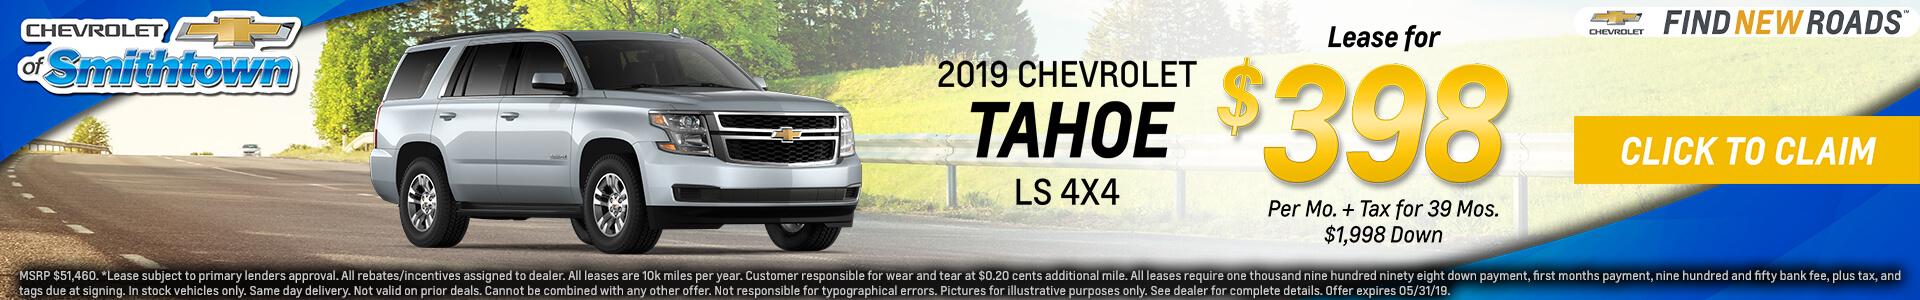 Chevrolet Tahoe $398 Lease